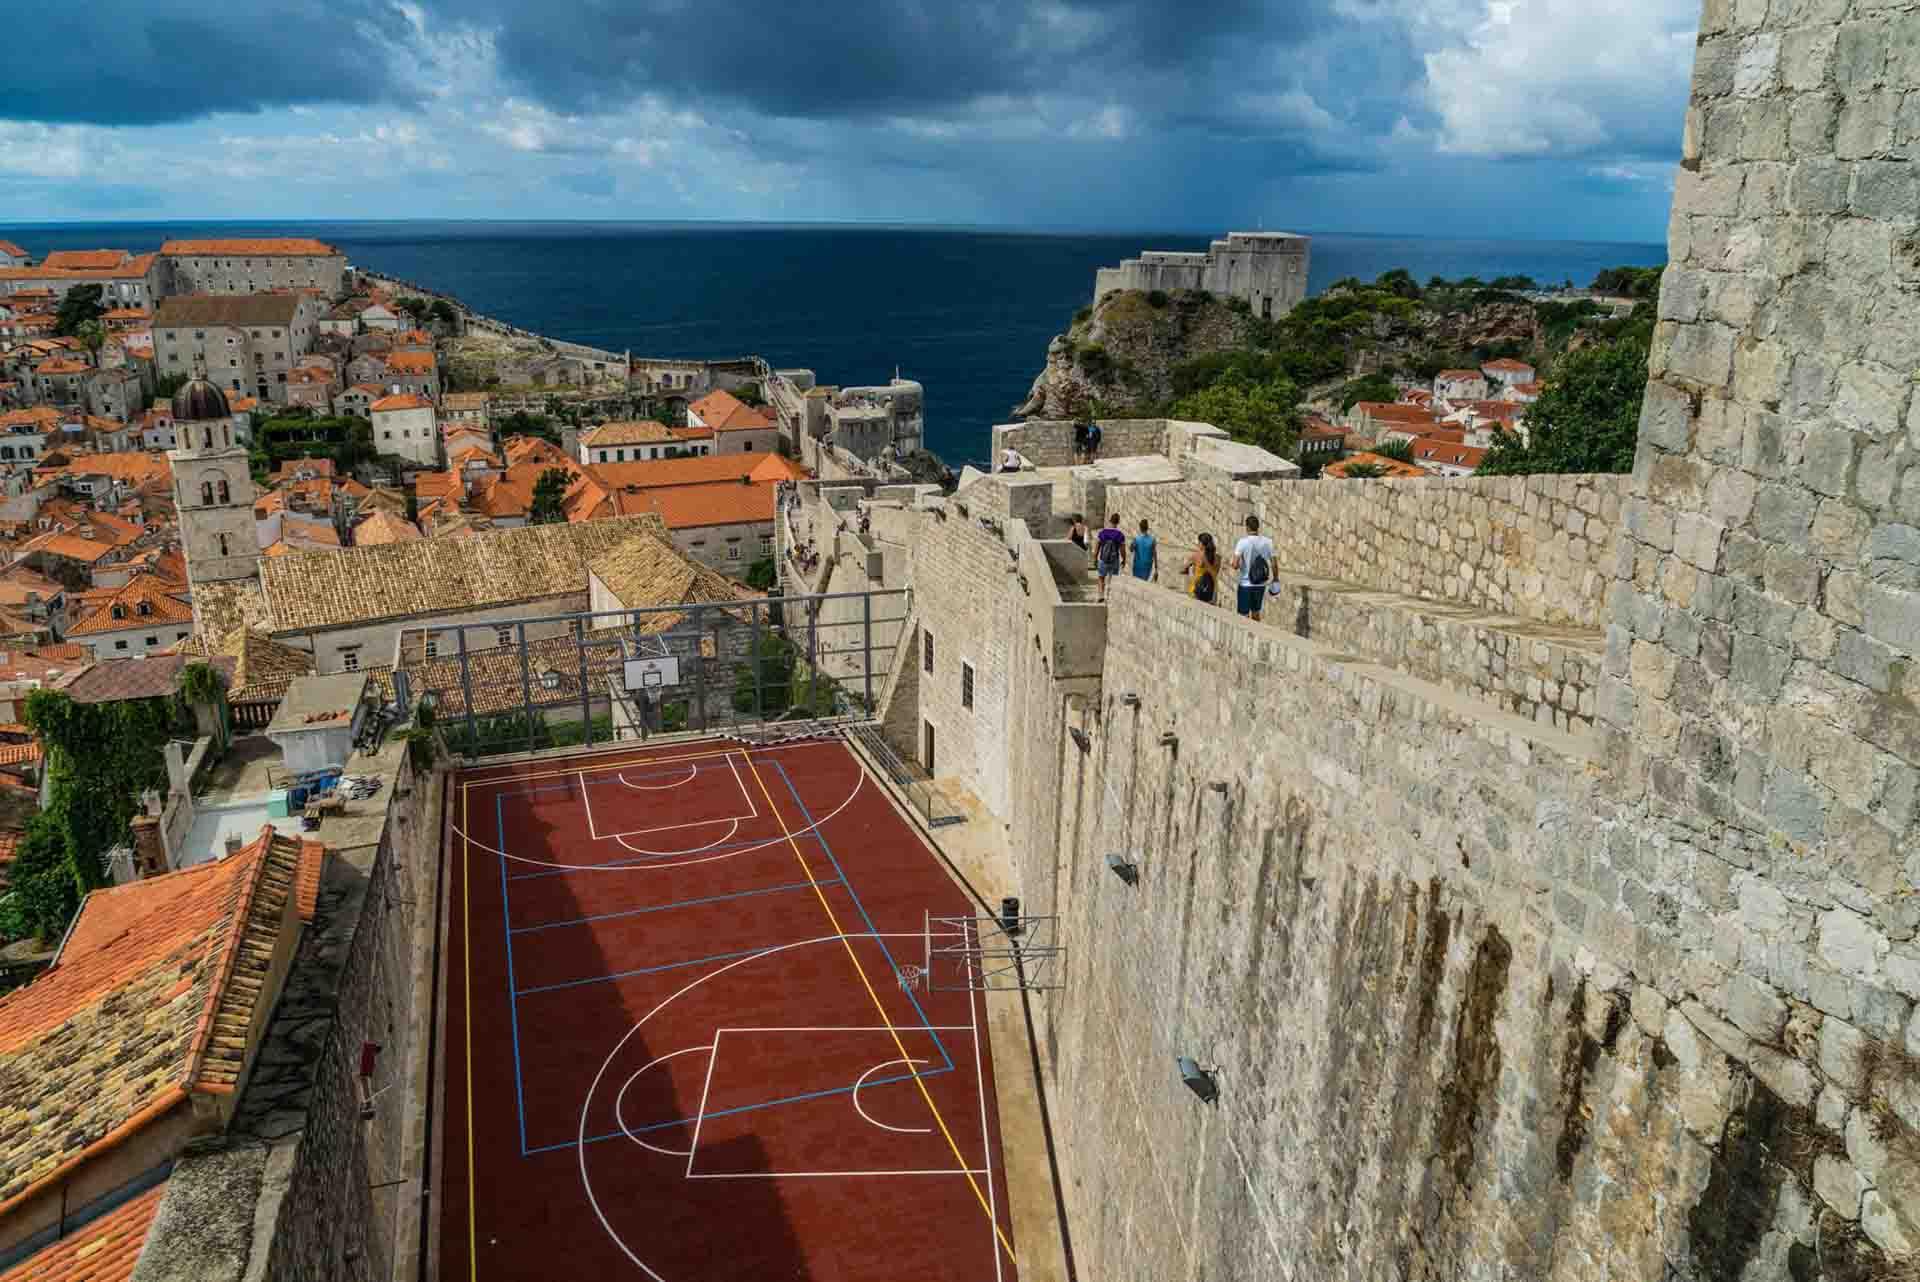 Croatia Dubrovnik City Walls tour 3, dubrovnik, croatia, pescart, photo blog, travel blog, blog, photo travel blog, enrico pescantini, pescantini